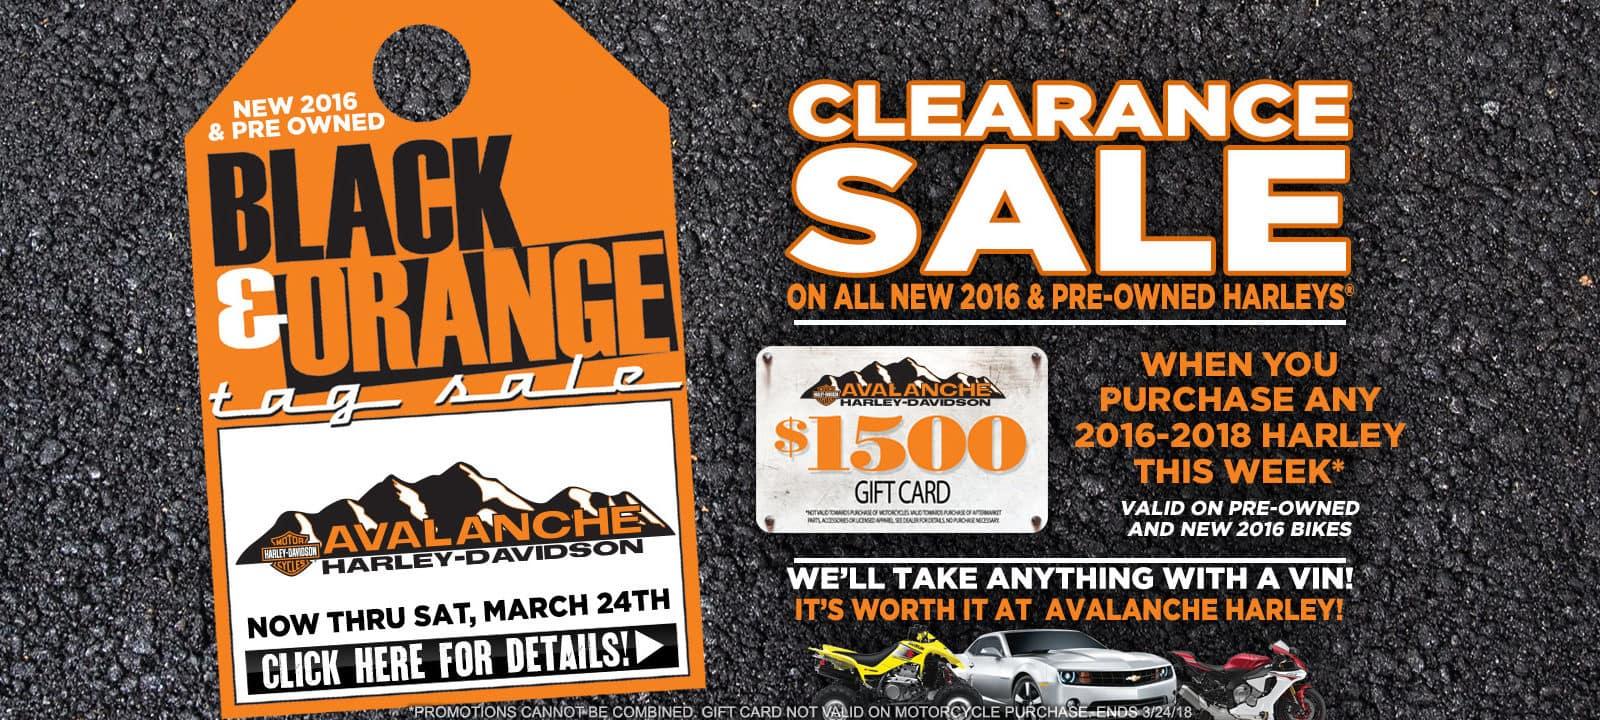 20180319-AHD-1800x720-Black-&-Orange-Tag-Sale-1500-Gift-Card